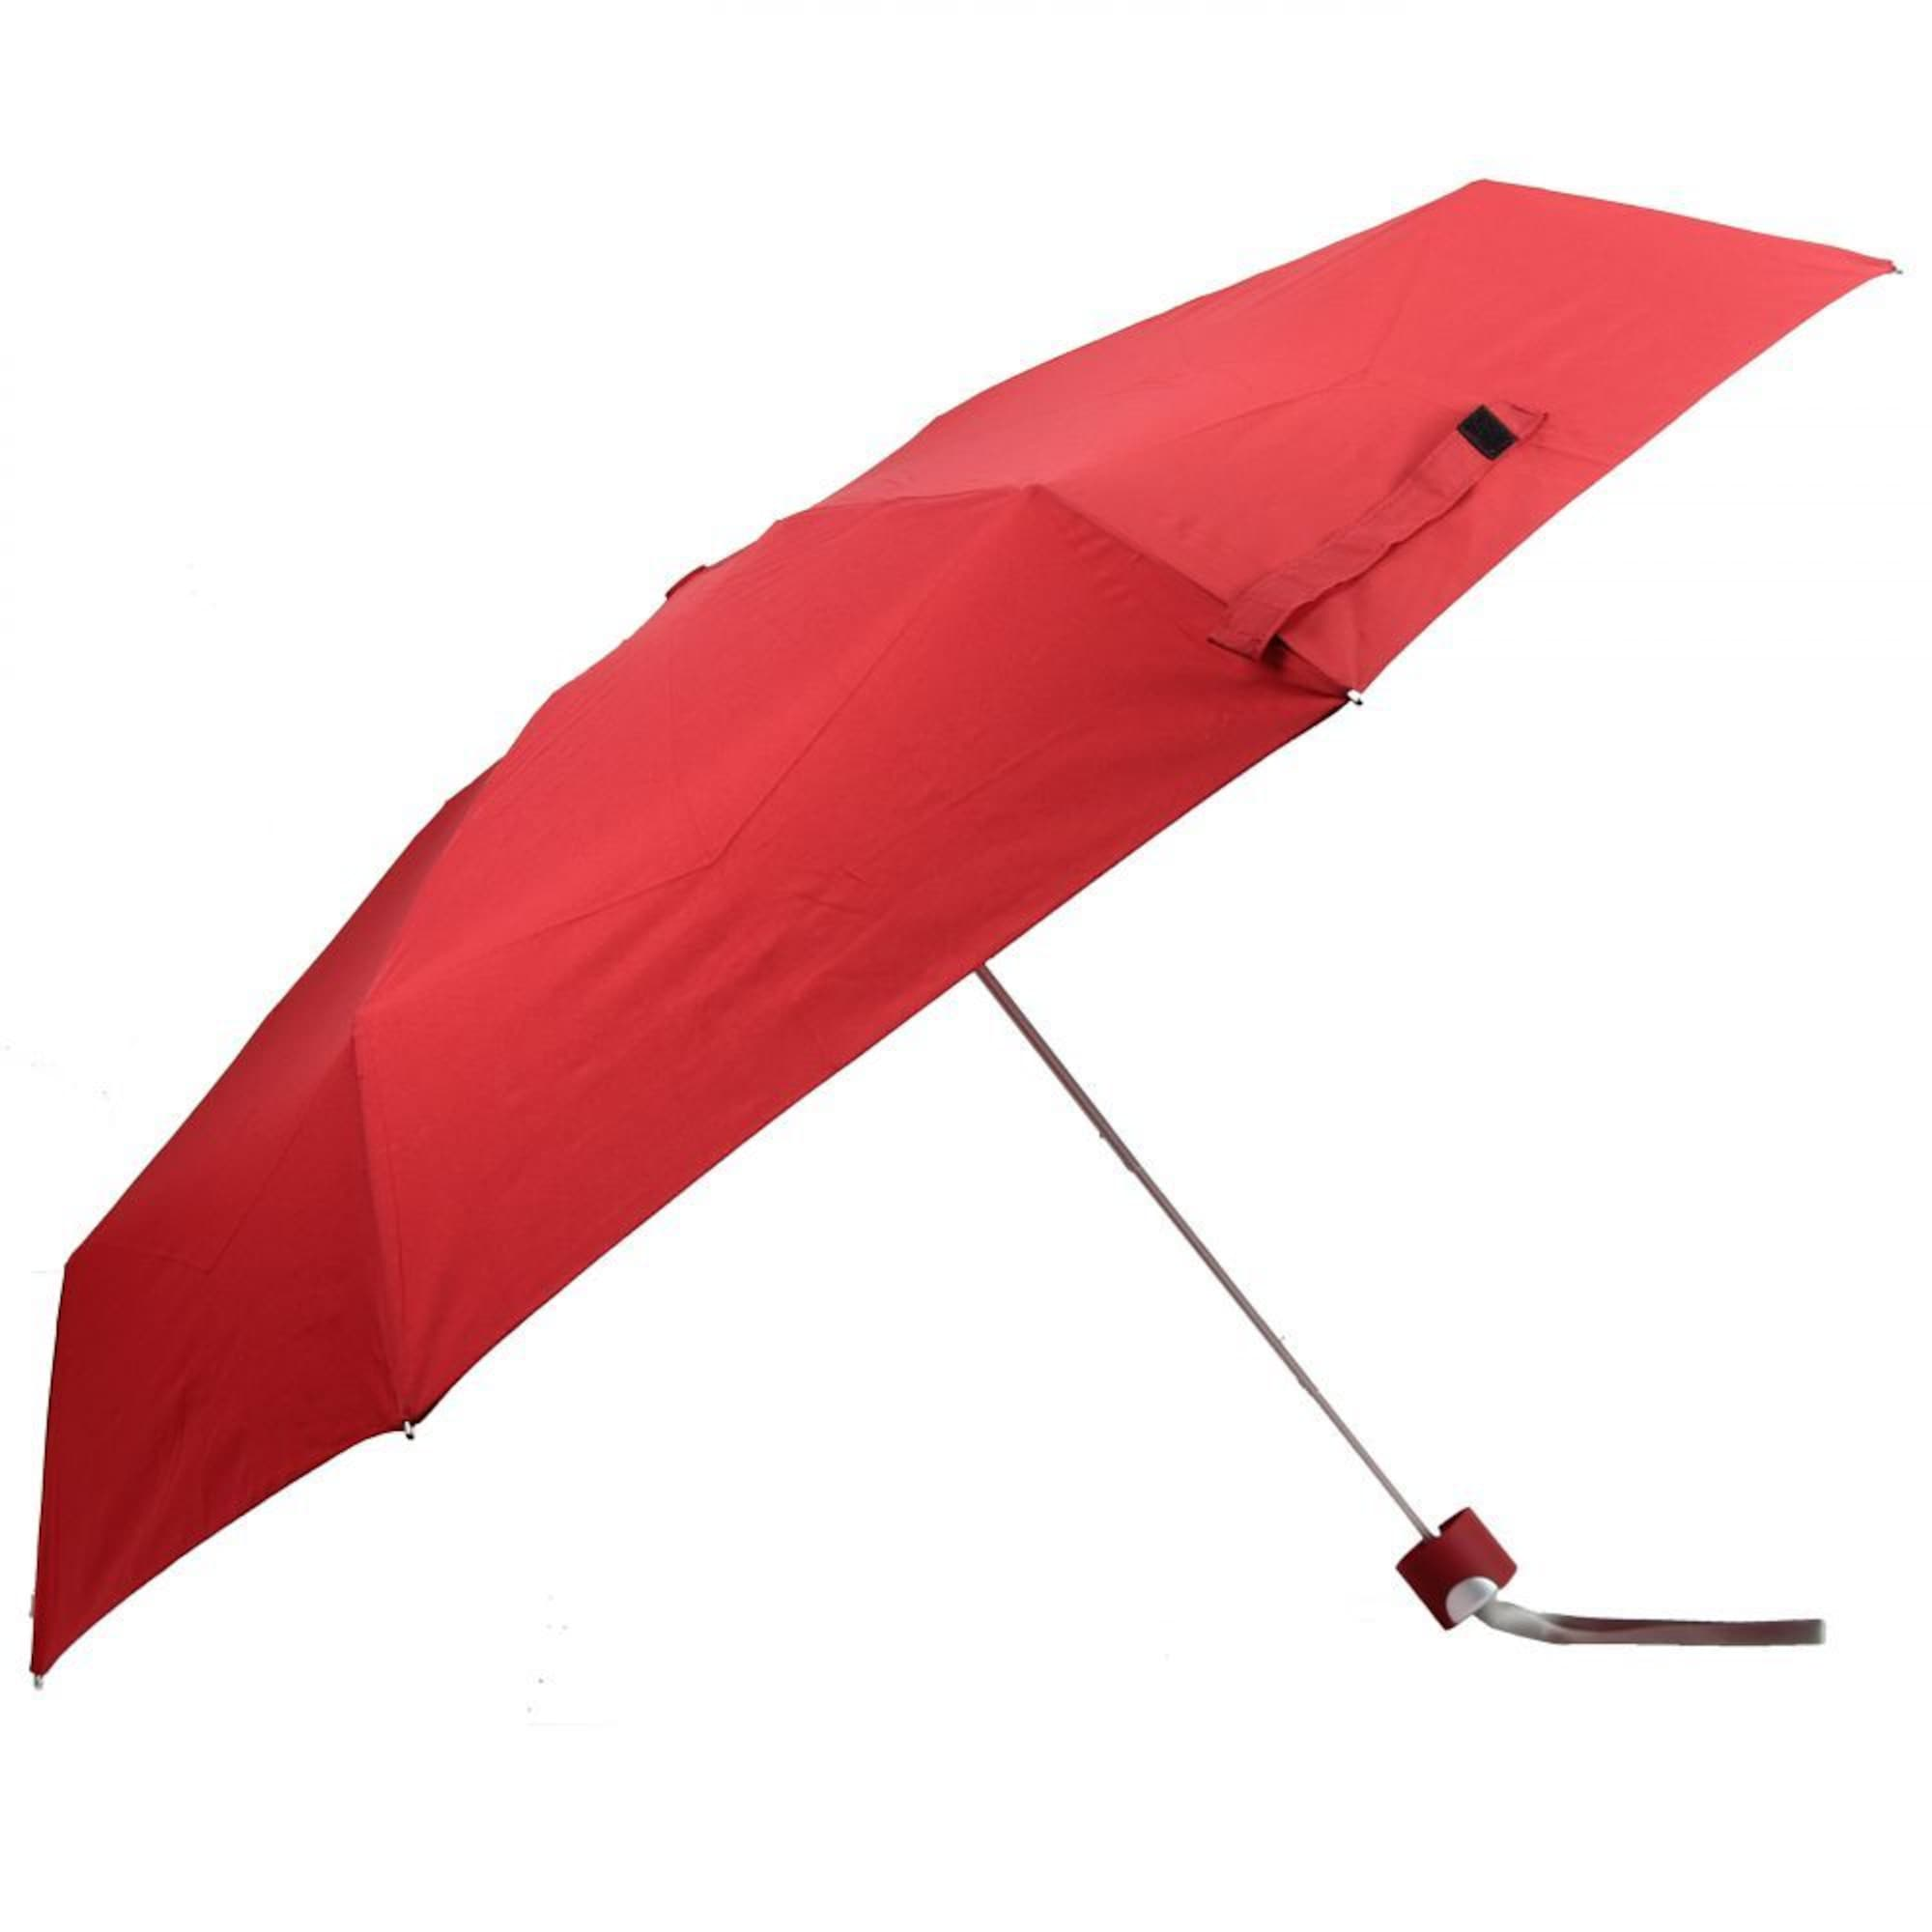 Taschenschirm 'Manual Piccolo' | Accessoires > Regenschirme | knirps